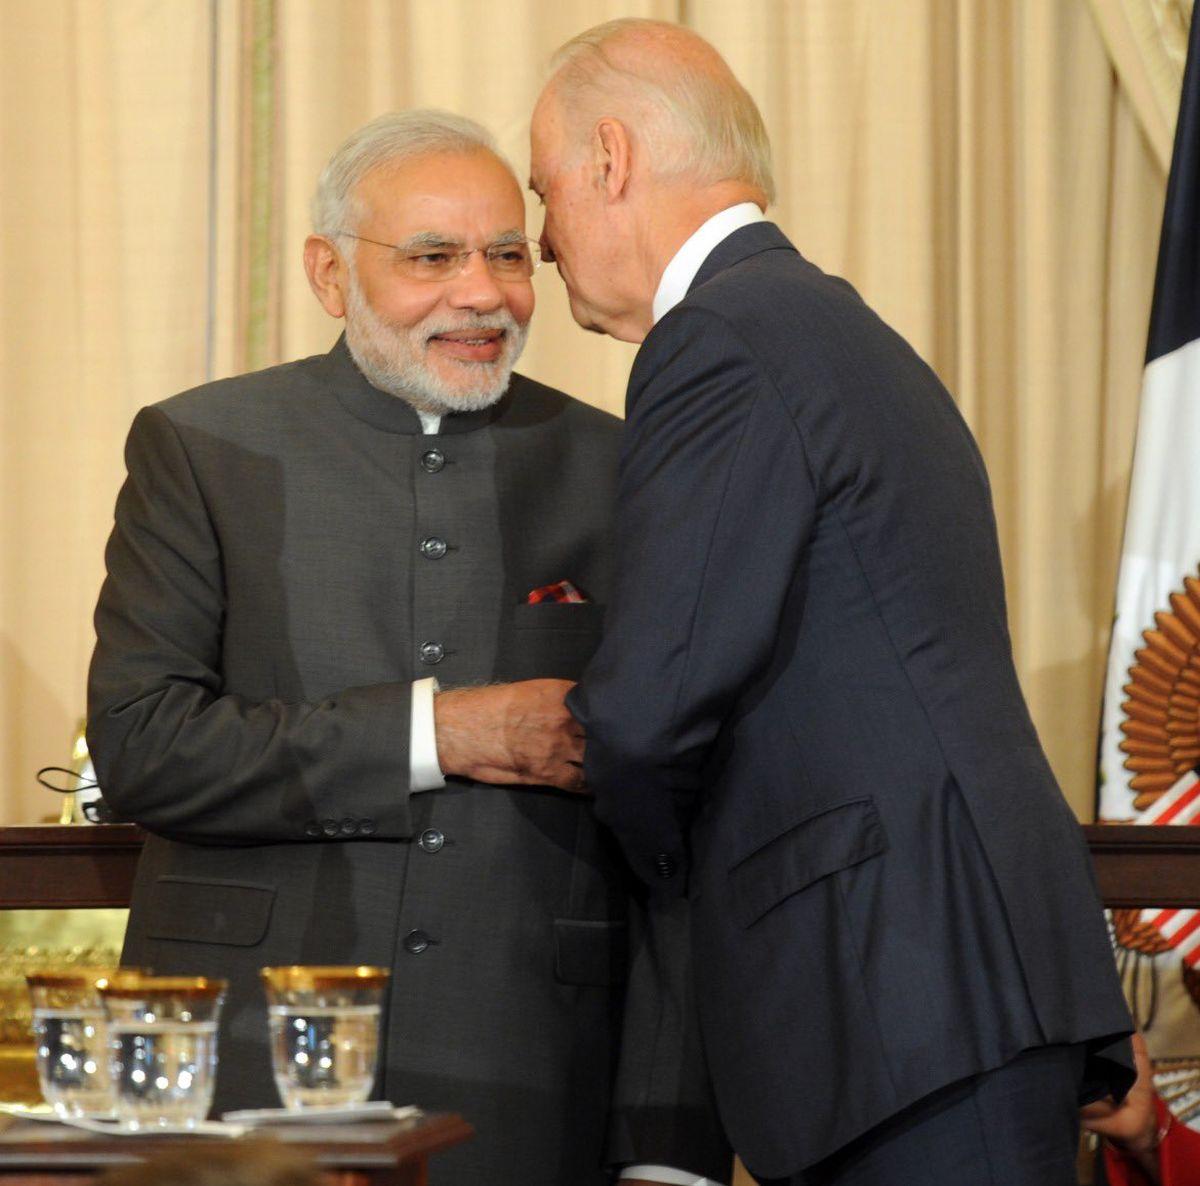 Modi-Biden bilateral talks on Sep 24 at White House